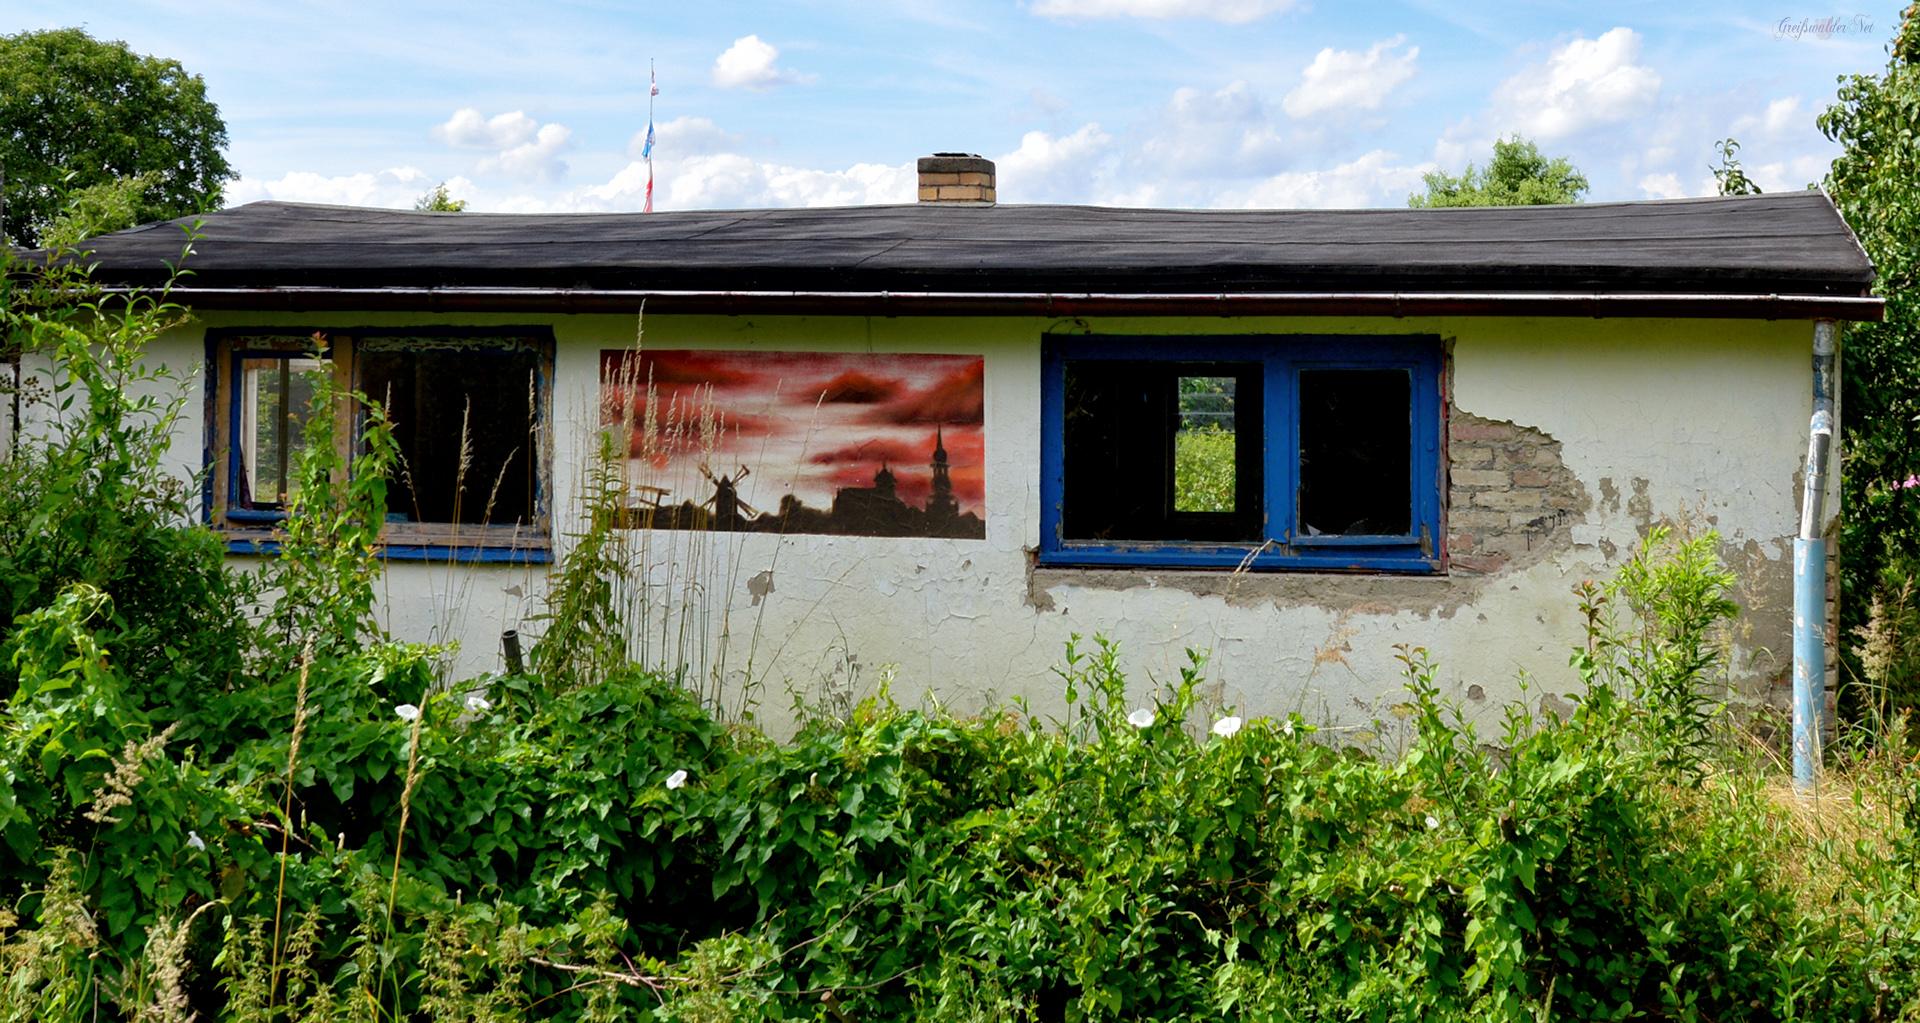 Graffiti an einer verfallenen Gartenlaube